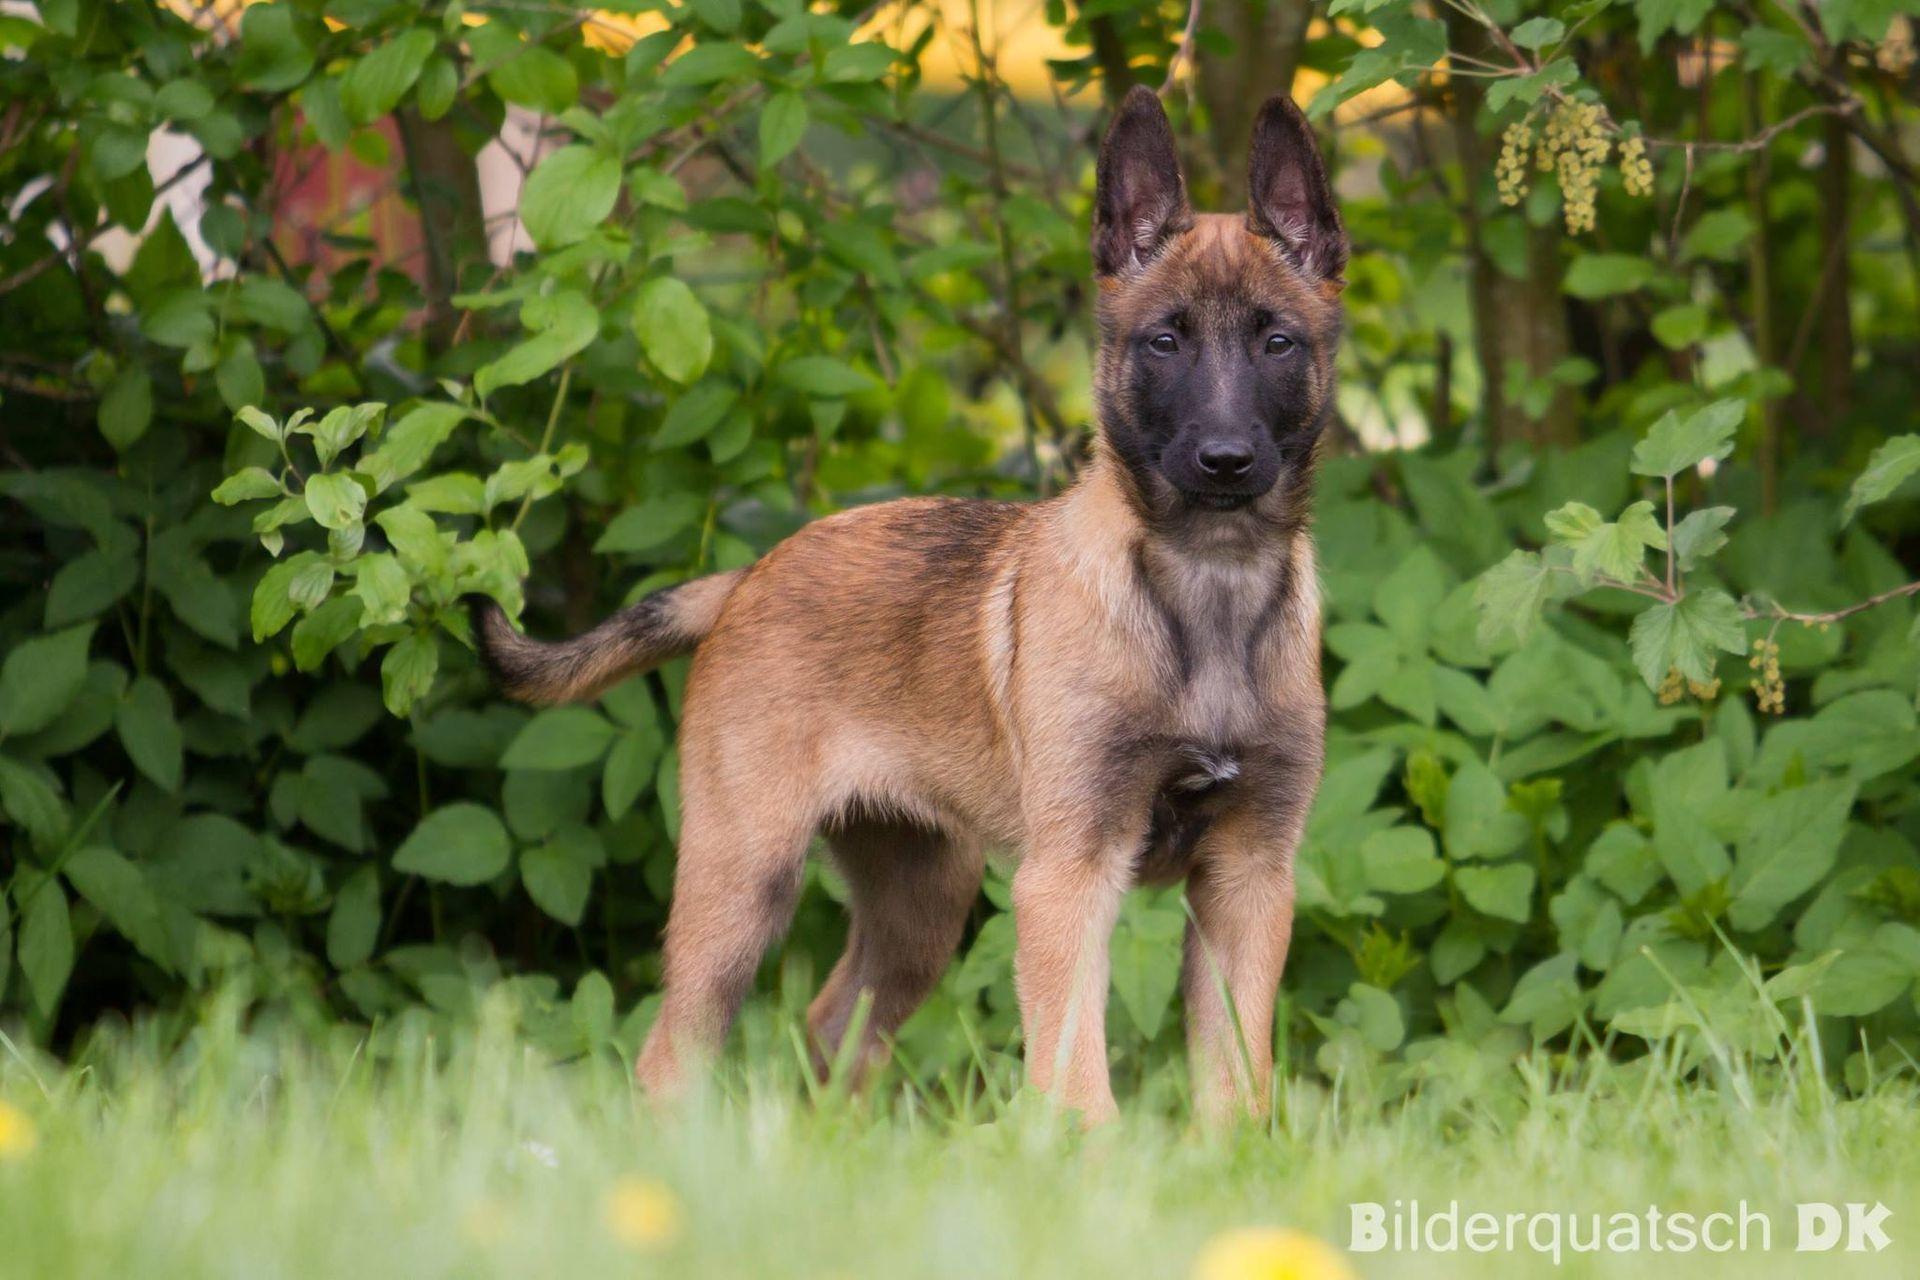 Willkommen bei der Hundeschule Canis!